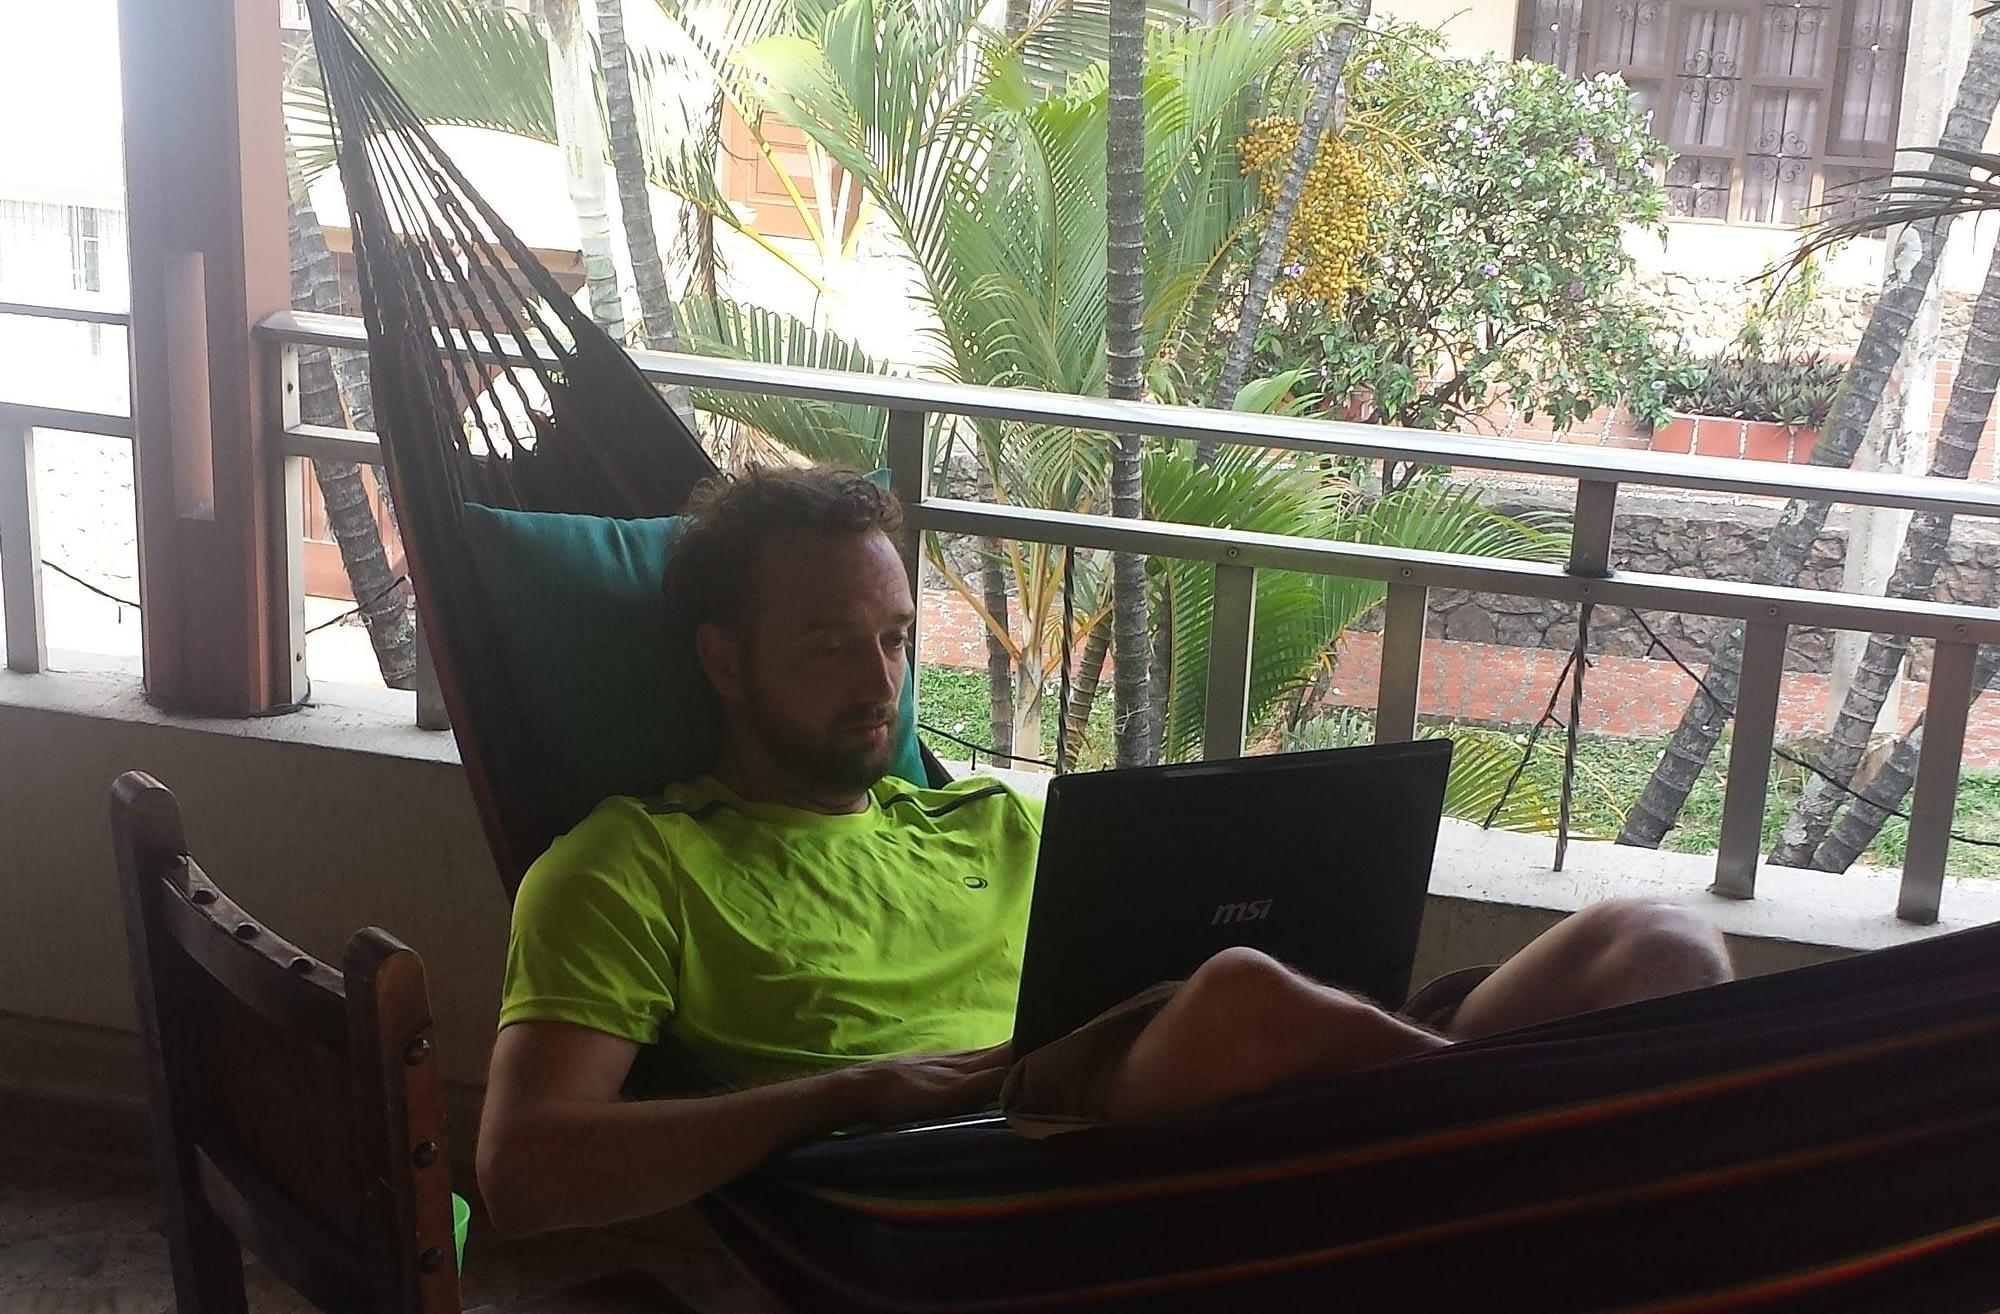 Combining work and pleasure; Ivo enjoying one of his favorite working spots